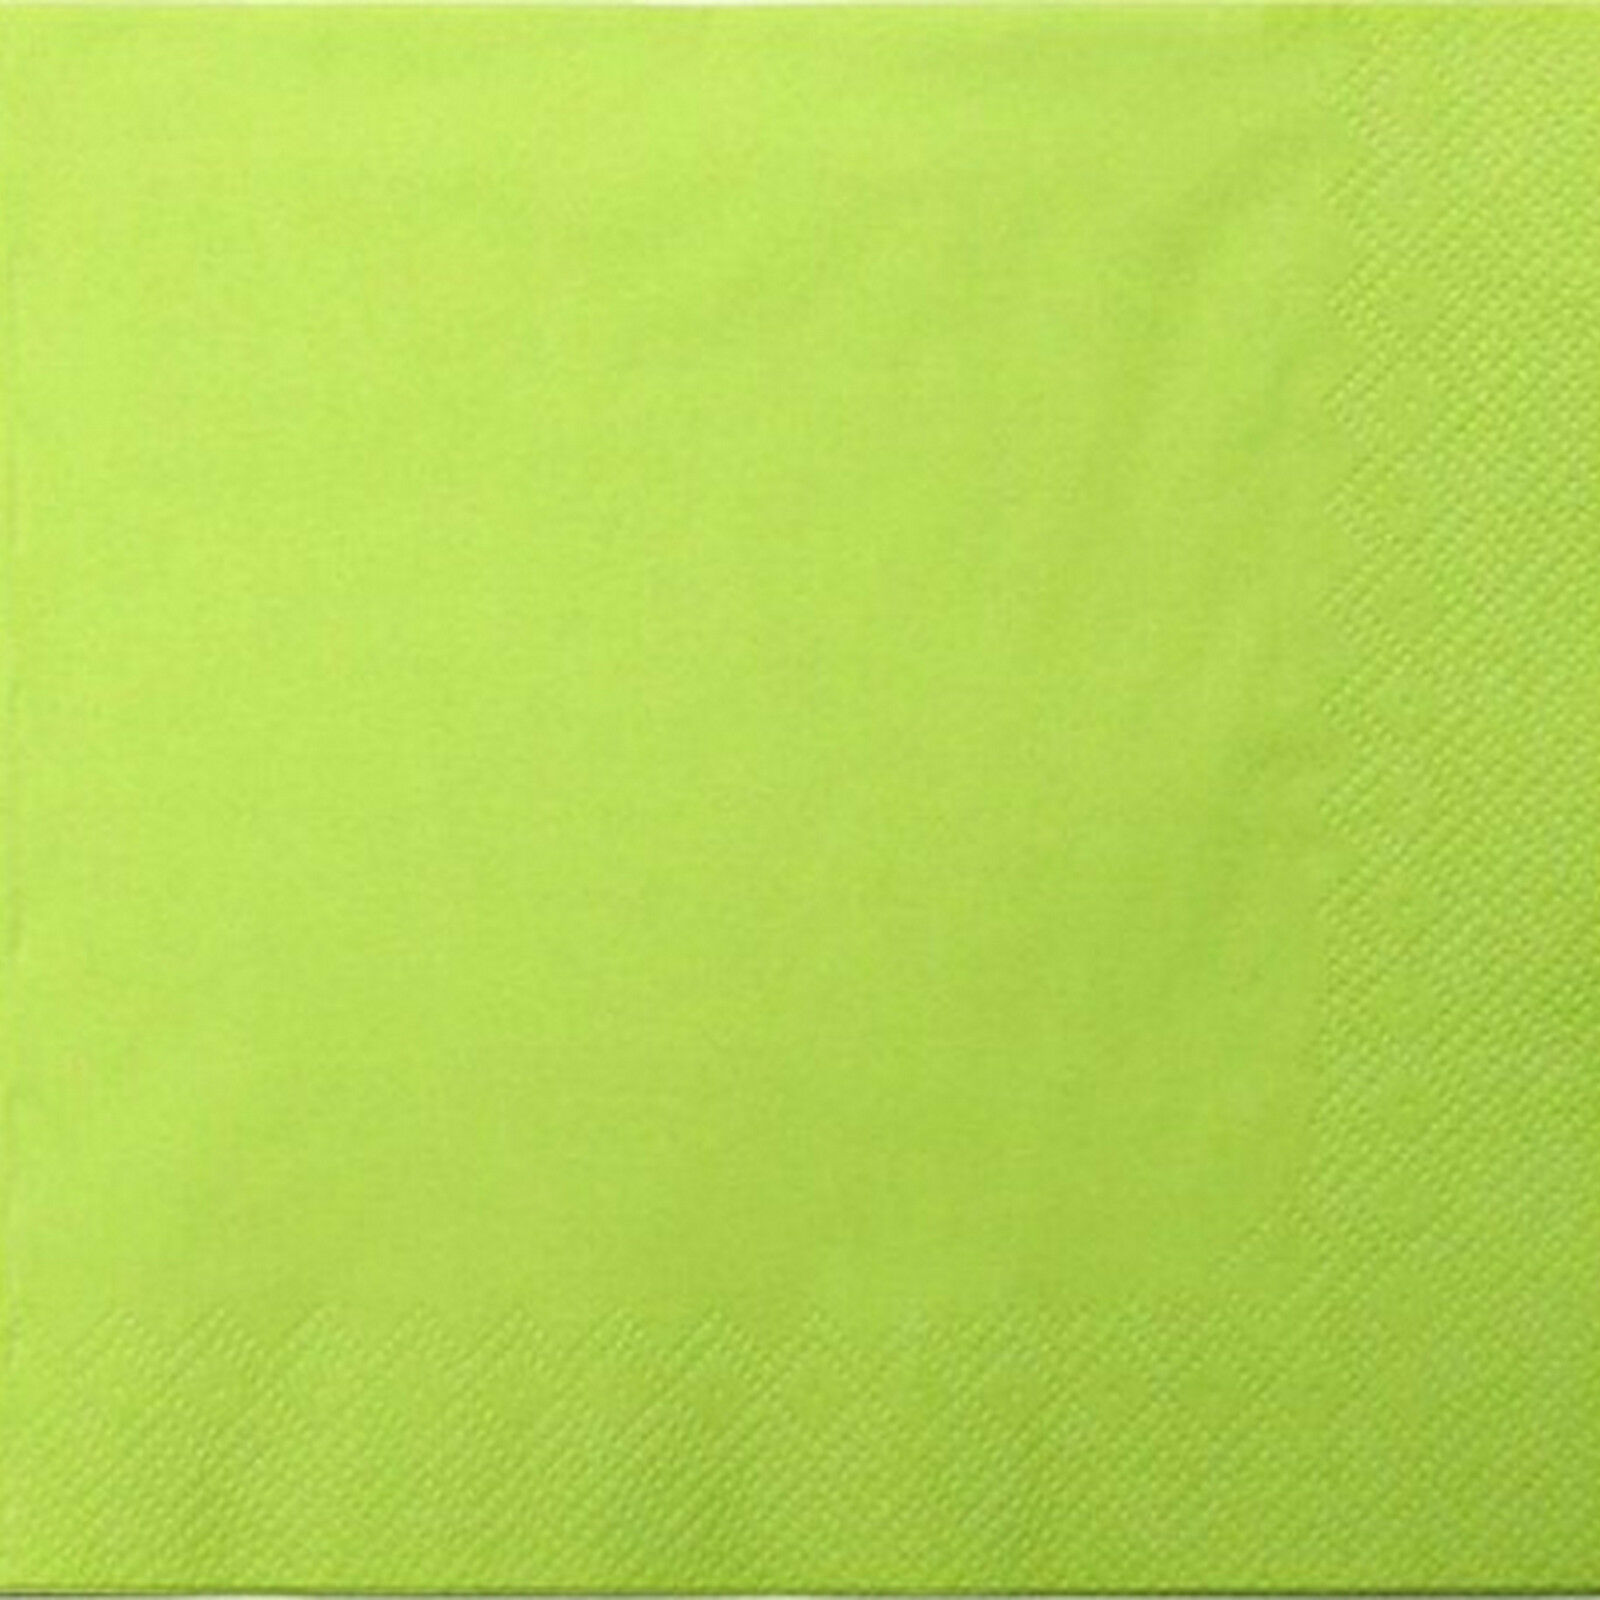 200 - 1.000 Stück Servietten 3-lagig 33x33 cm  Papierservietten Tissue-Qualität - Lime (Kiwi), 200 Stück